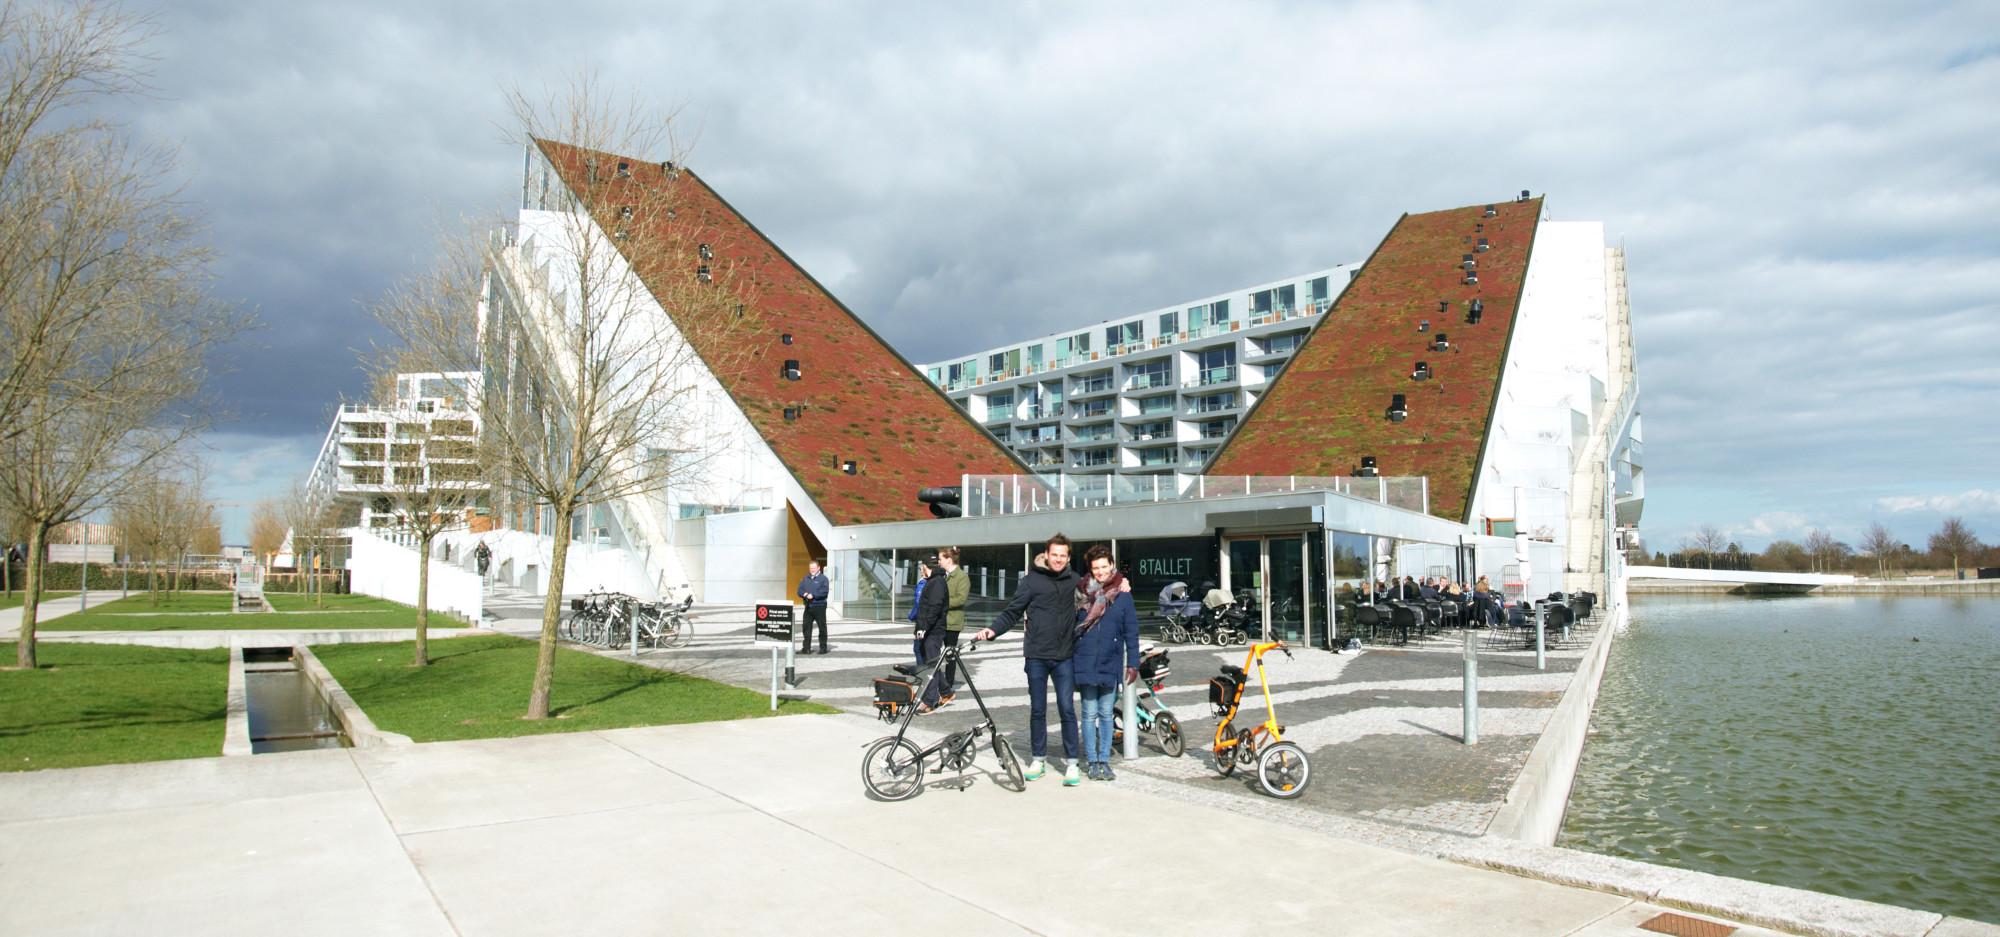 8house in Copenhagen by BIG